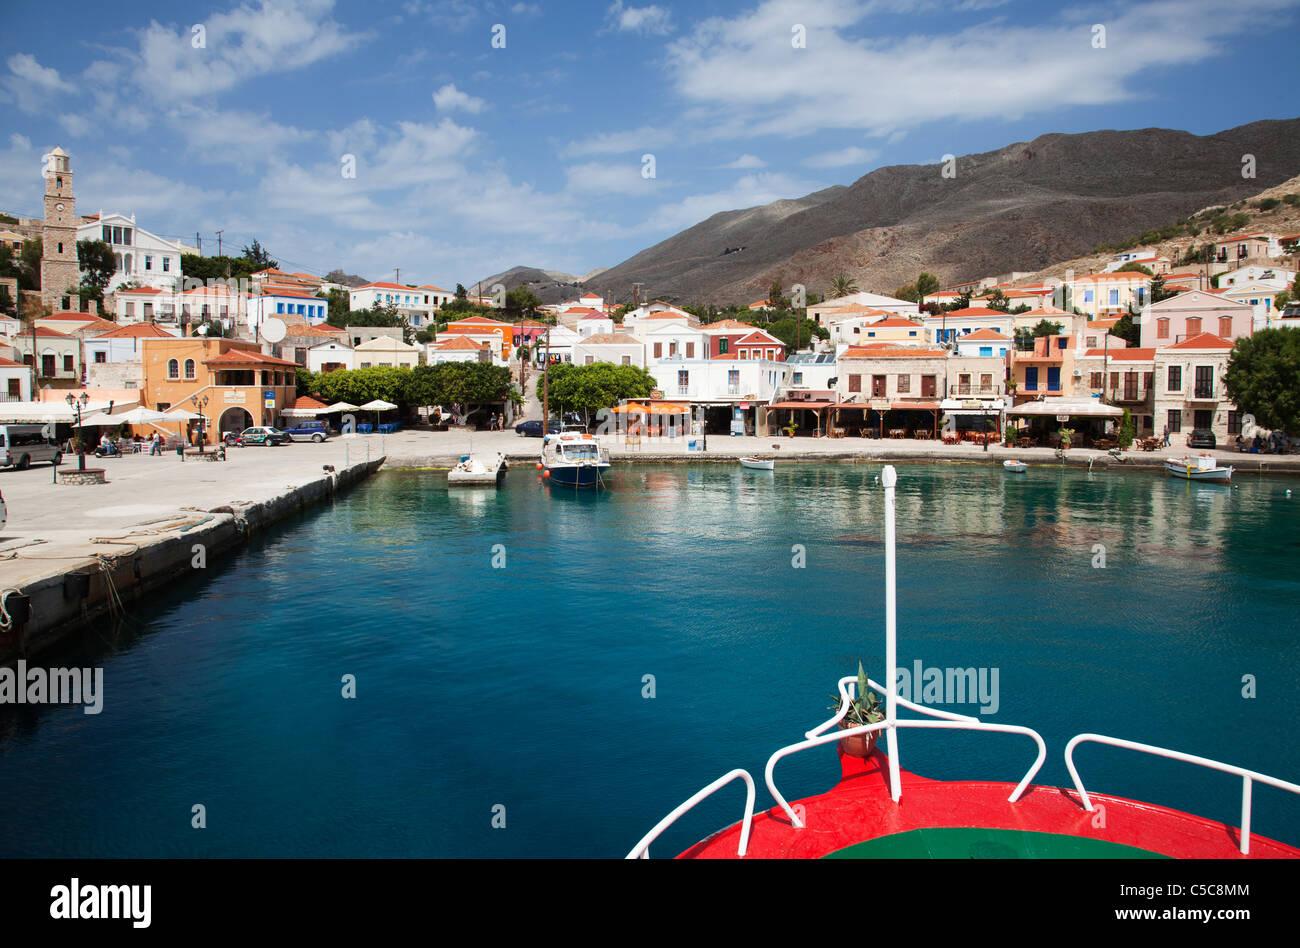 Greece island of Chalki Halki harbour - Stock Image